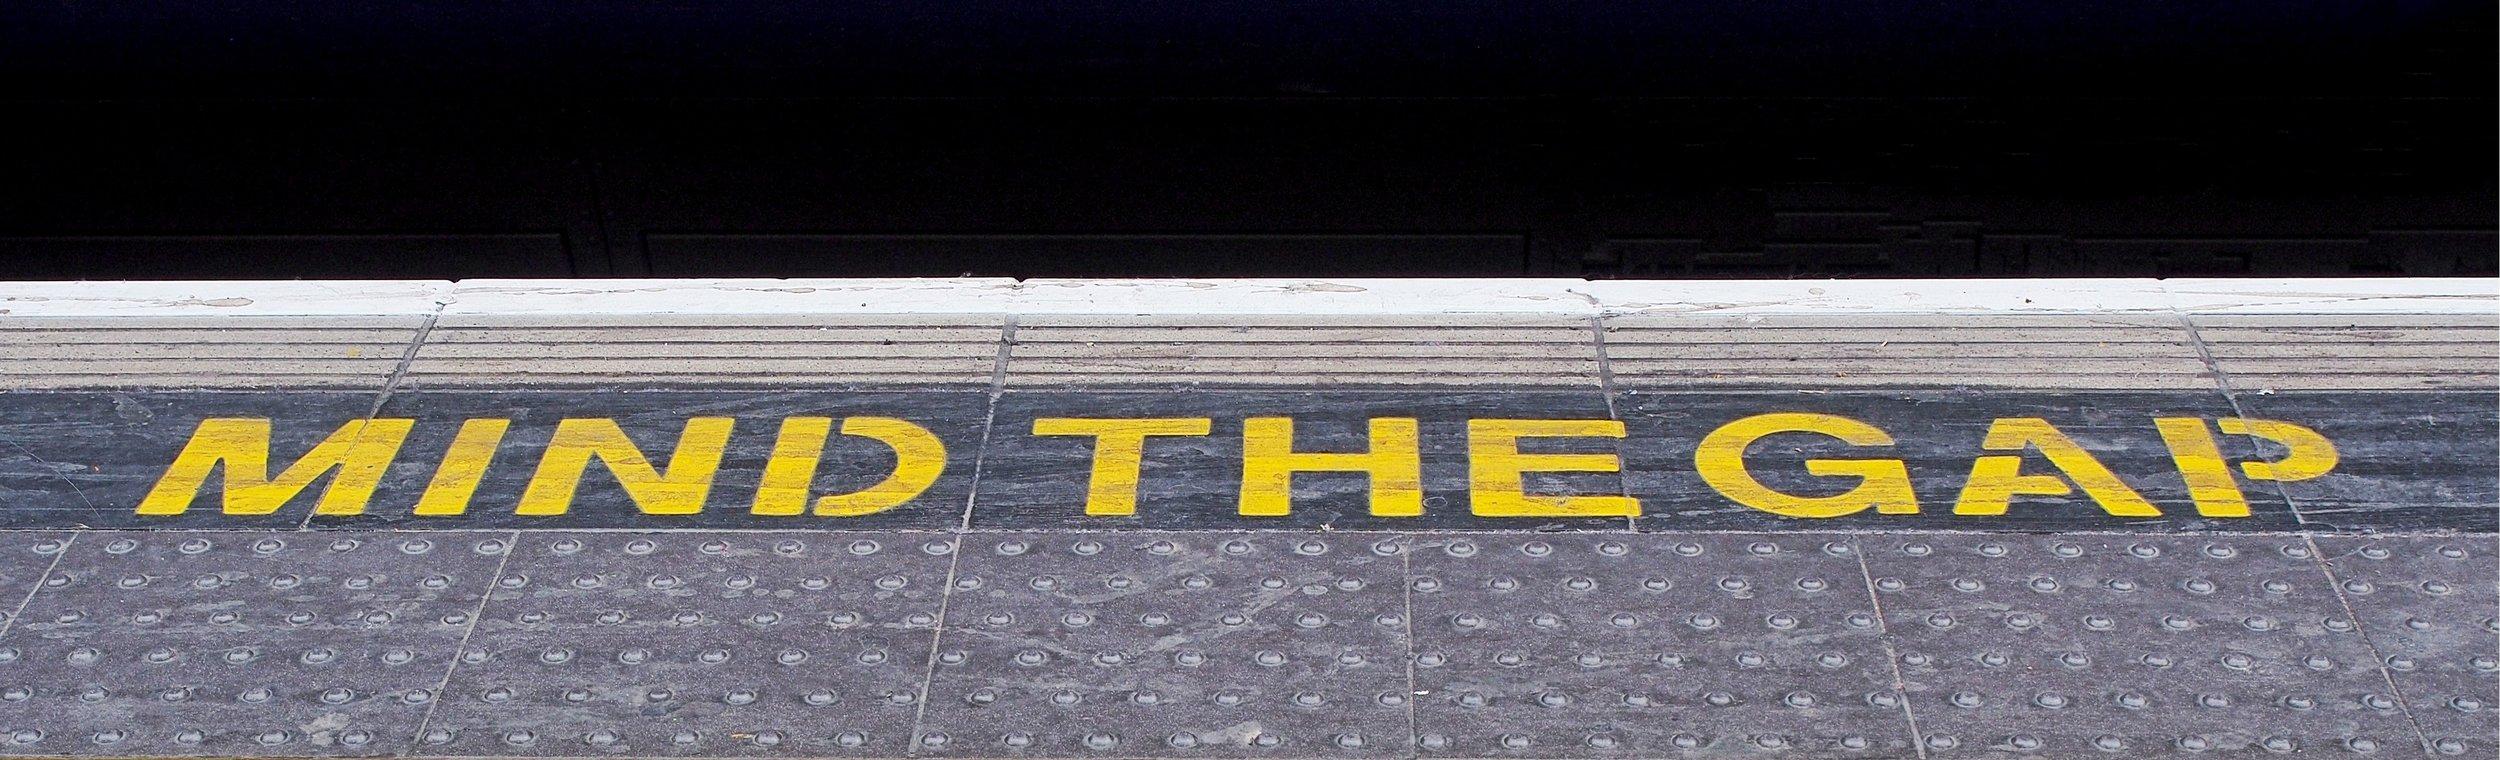 asphalt-communication-commuter-221310.jpg